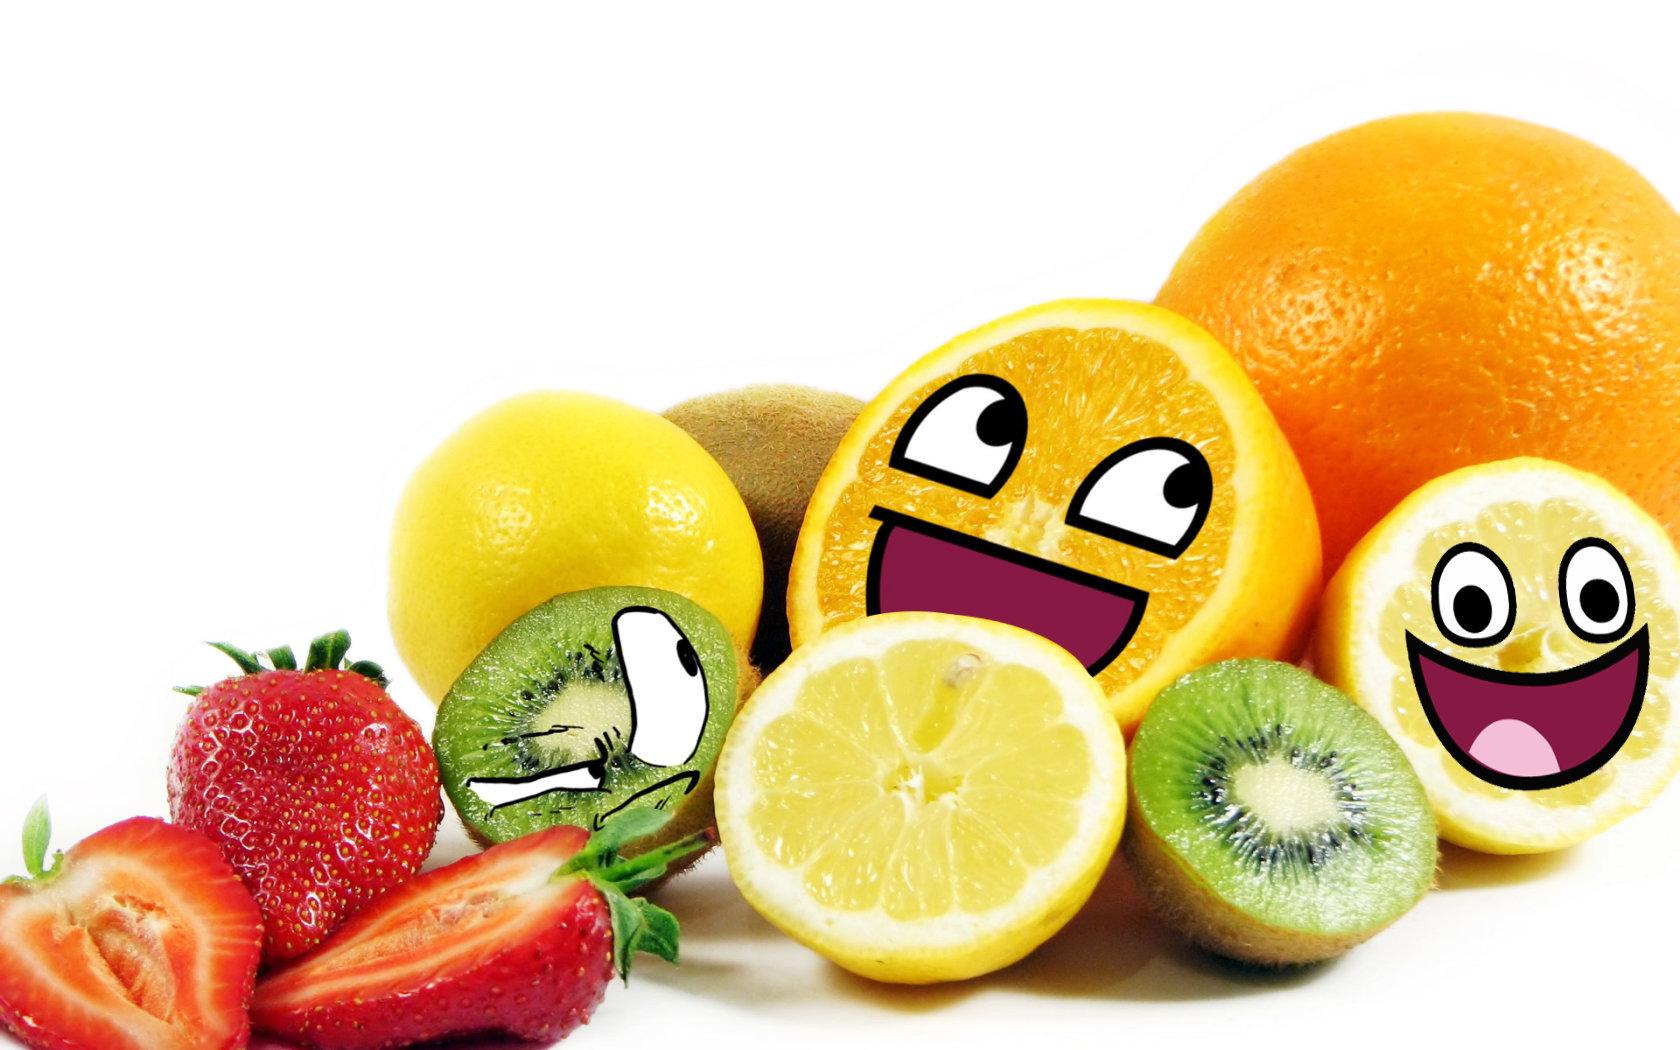 Smiley wallpaper and background image 1680x1050 id 61381 for Immagini divertenti desktop